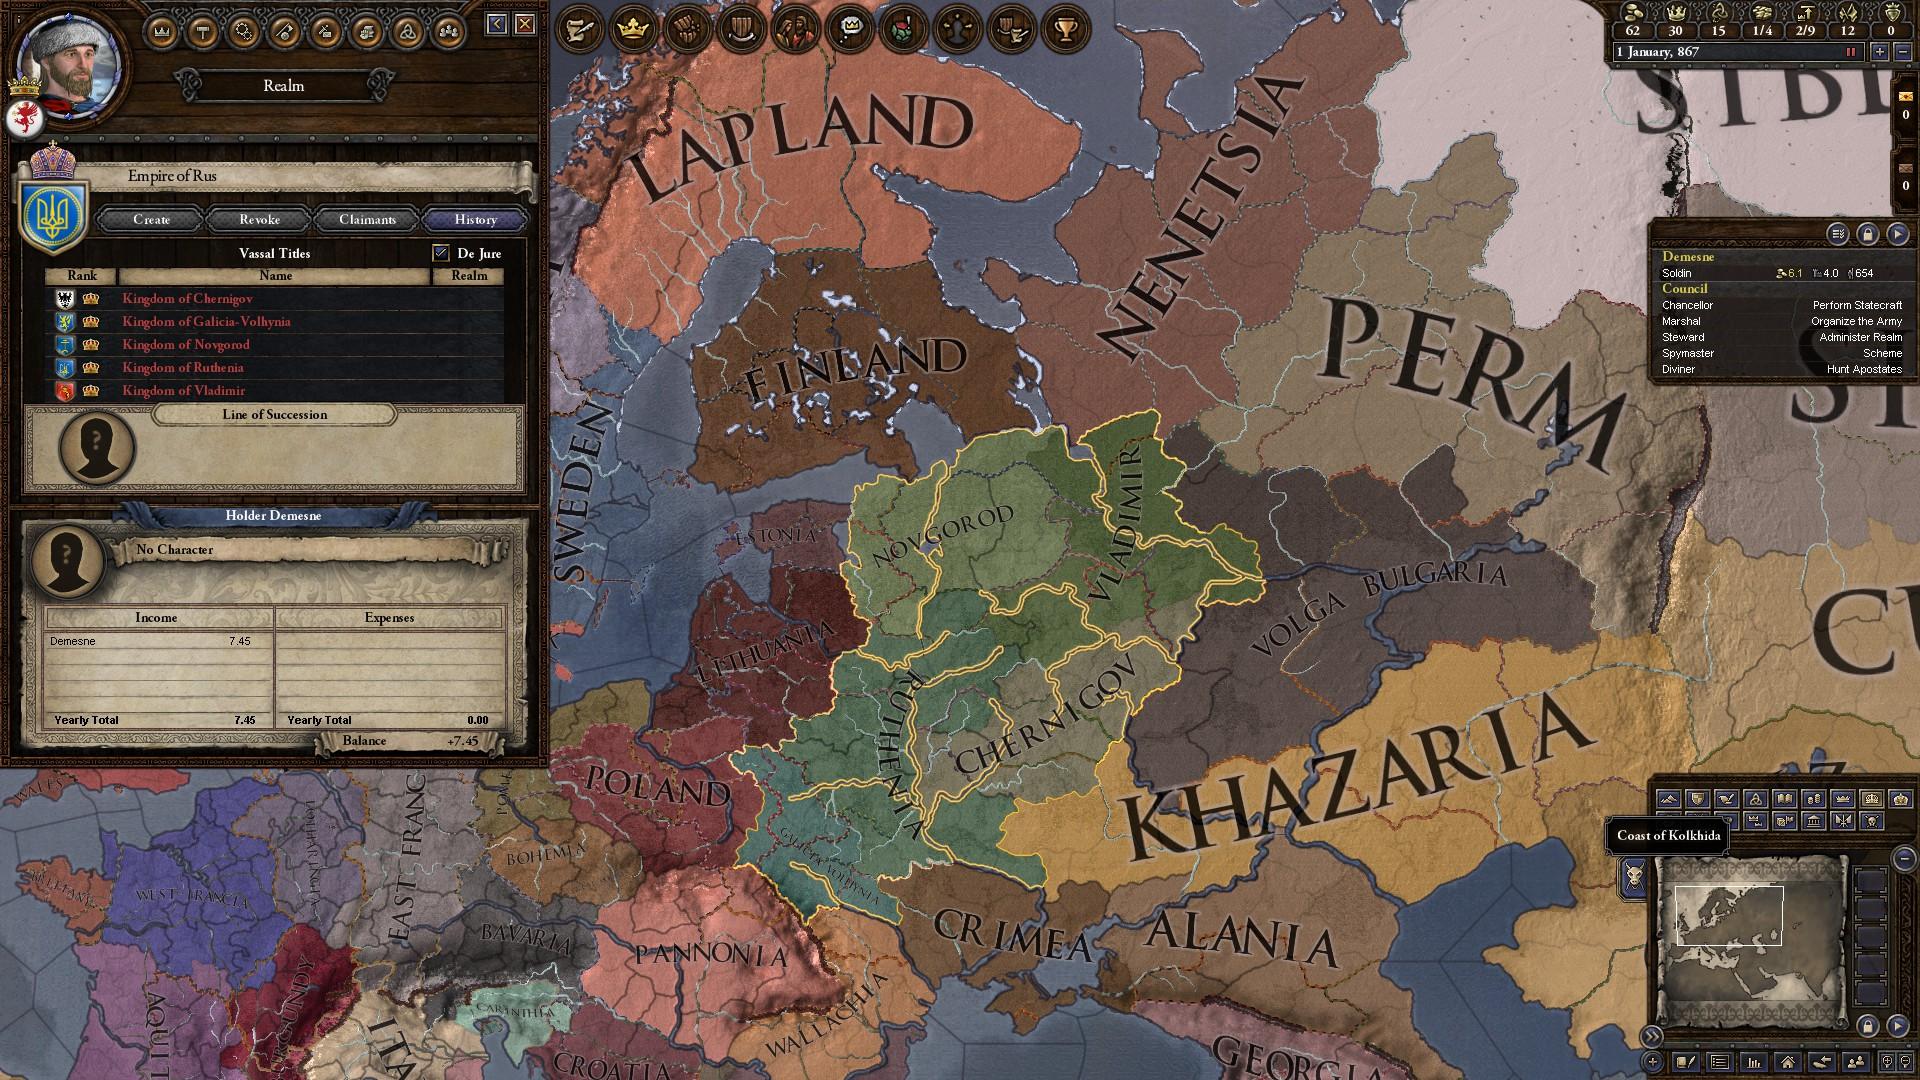 empire_of_rus_867.jpg